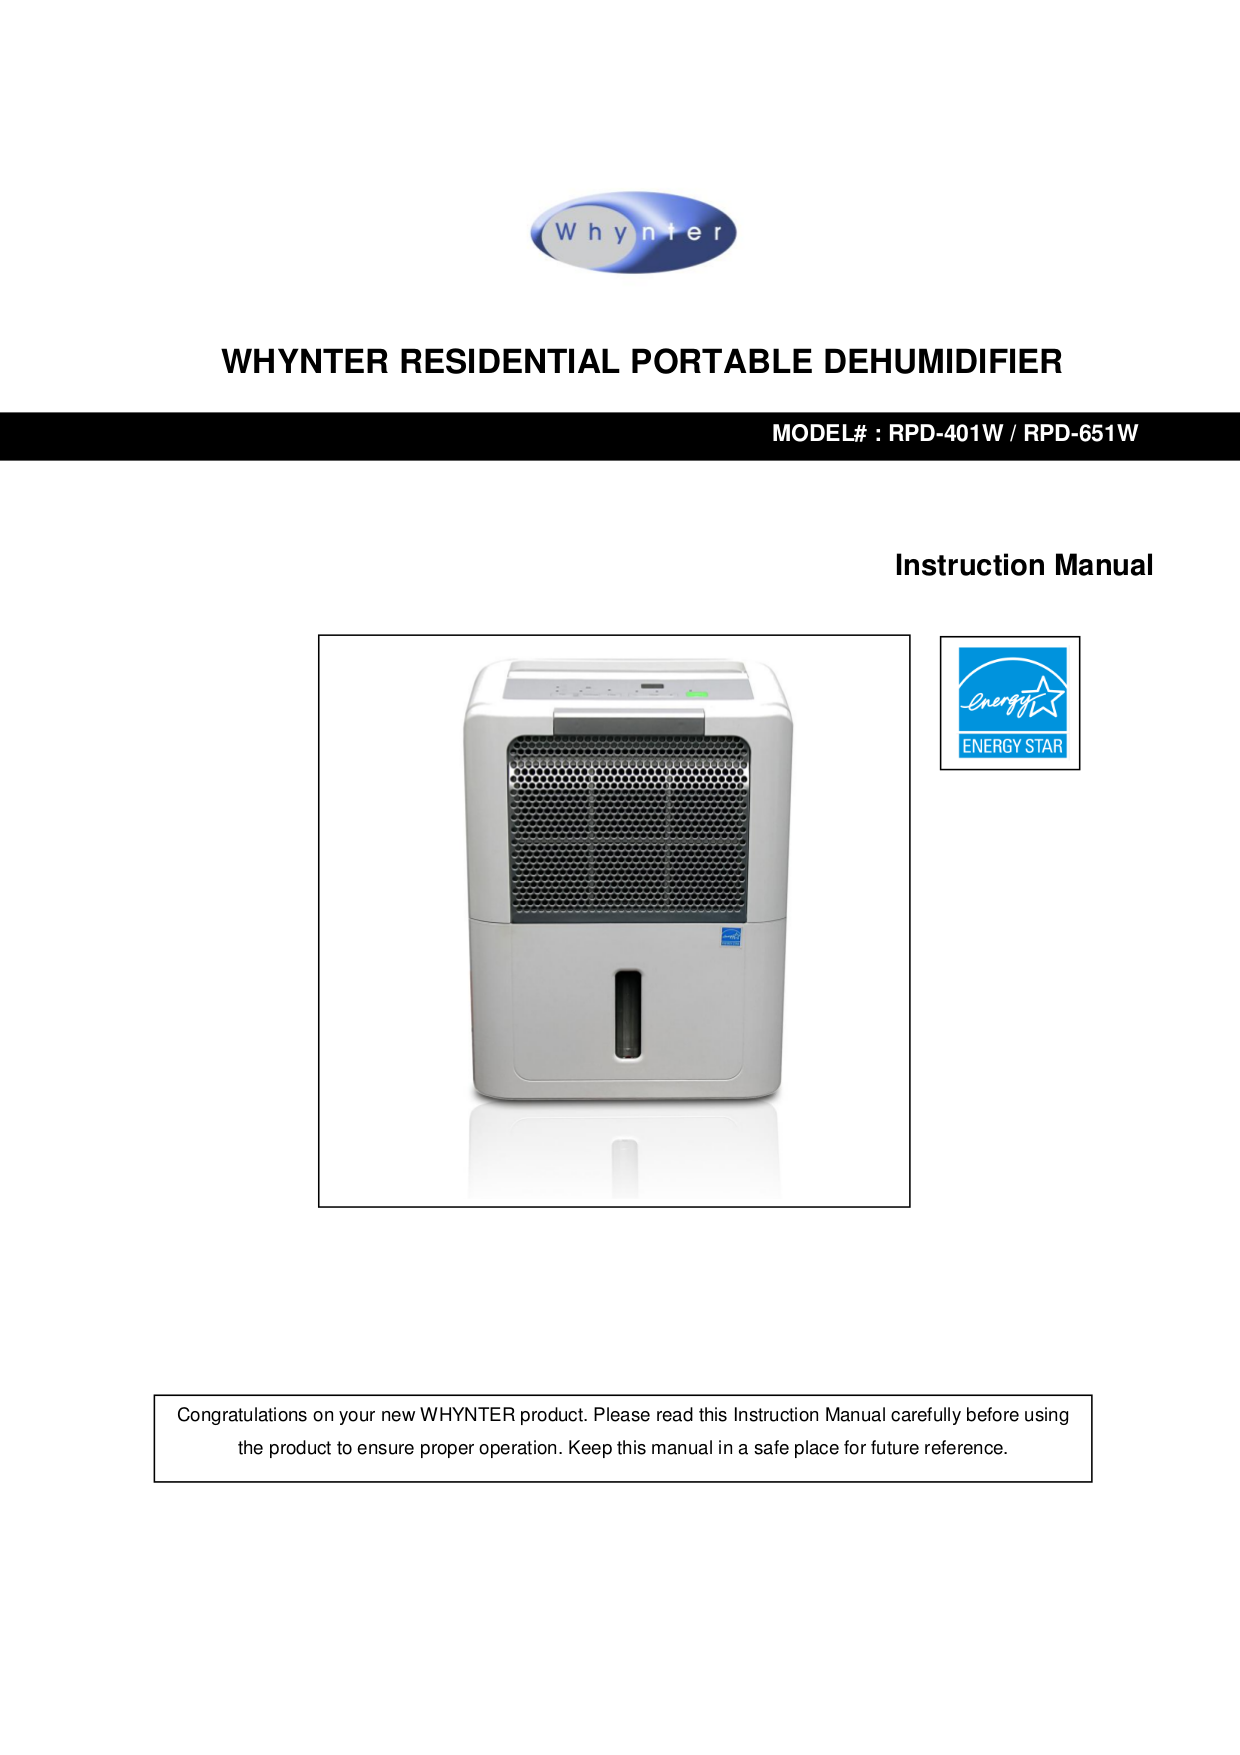 pdf for Whynter Dehumidifier RPD-651W manual